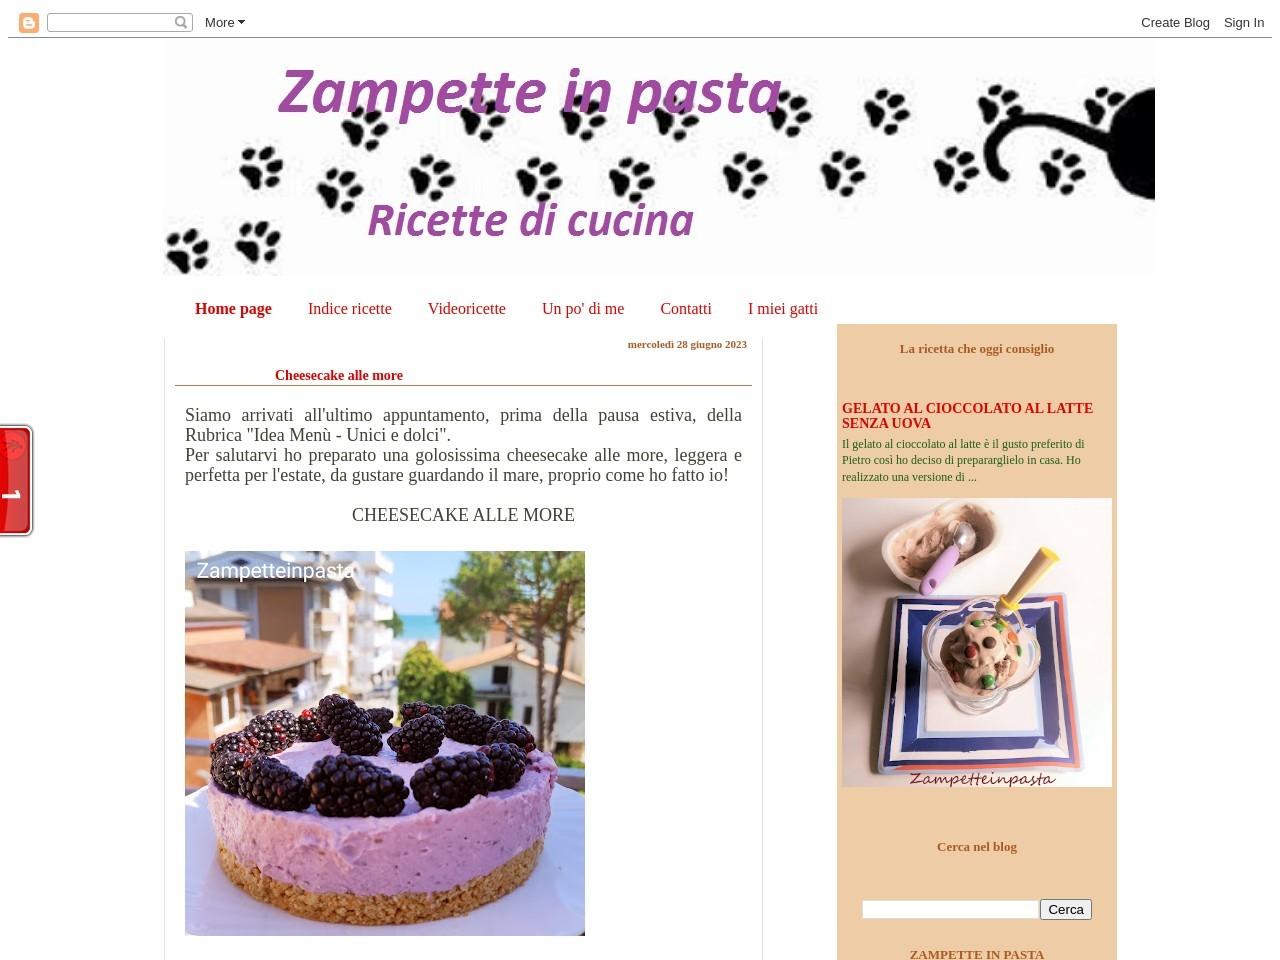 zampette-in-pasta